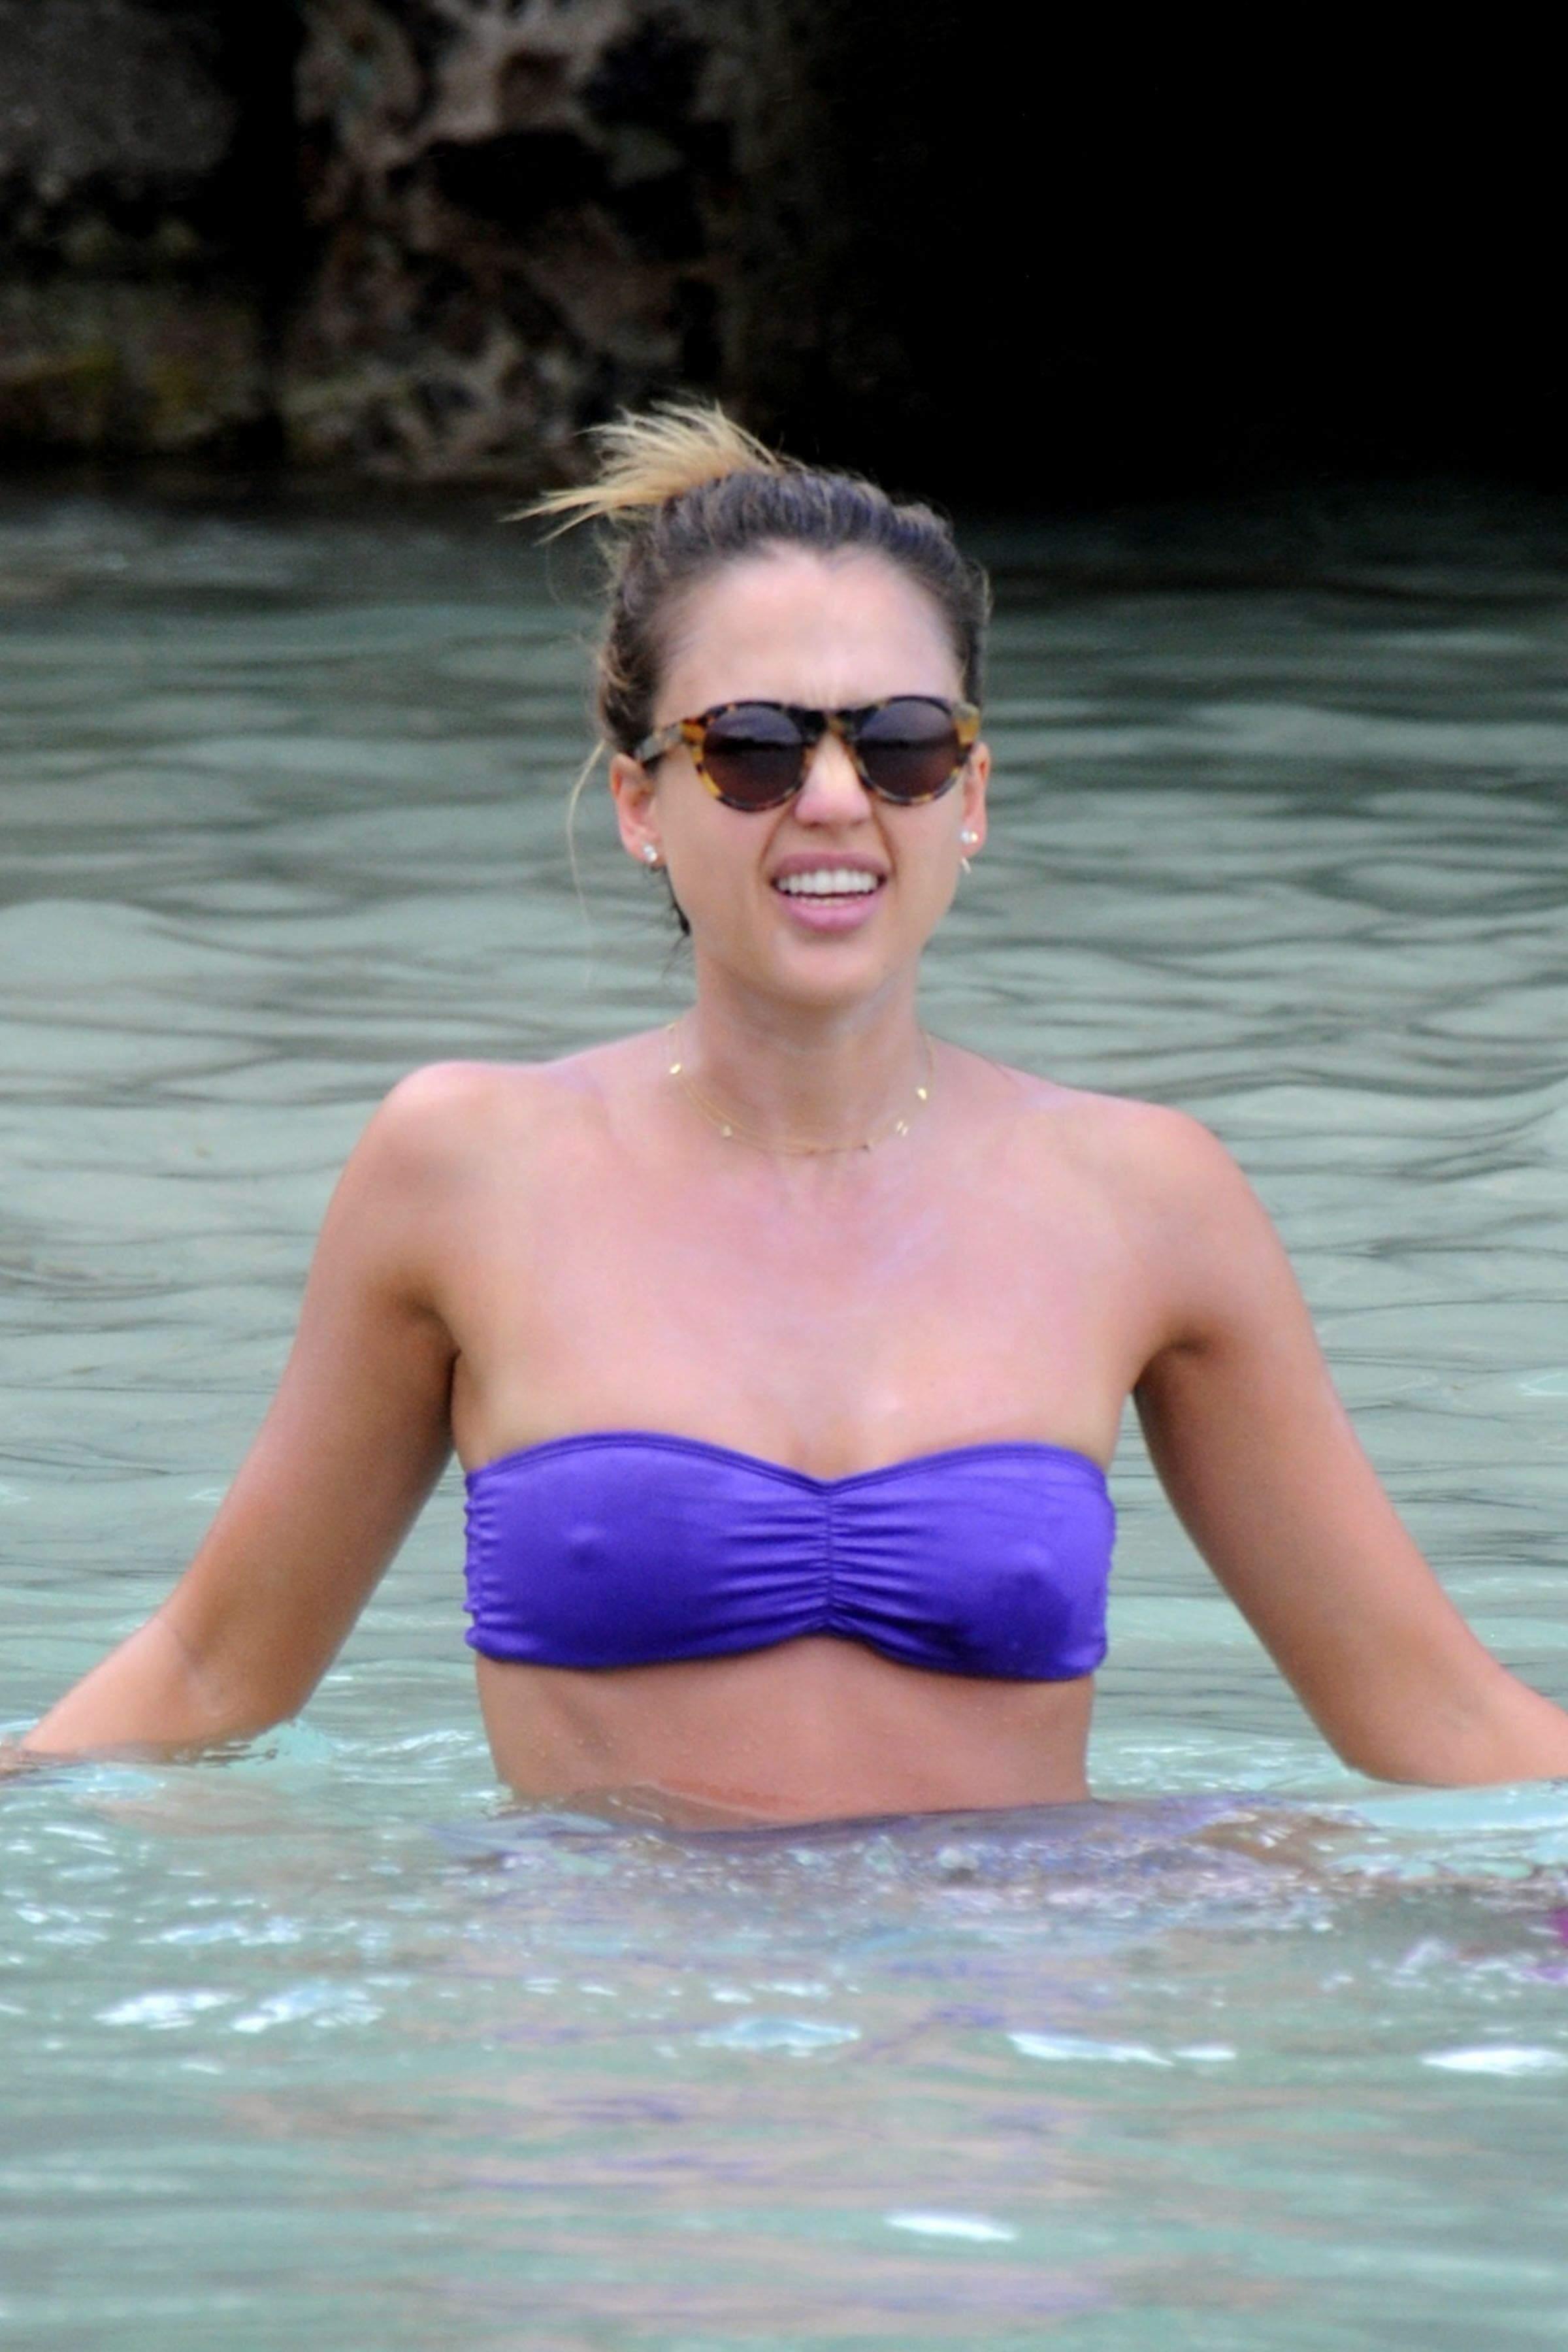 jessica-alba-see-thru-bikini-nude-girls-with-amazing-bodies